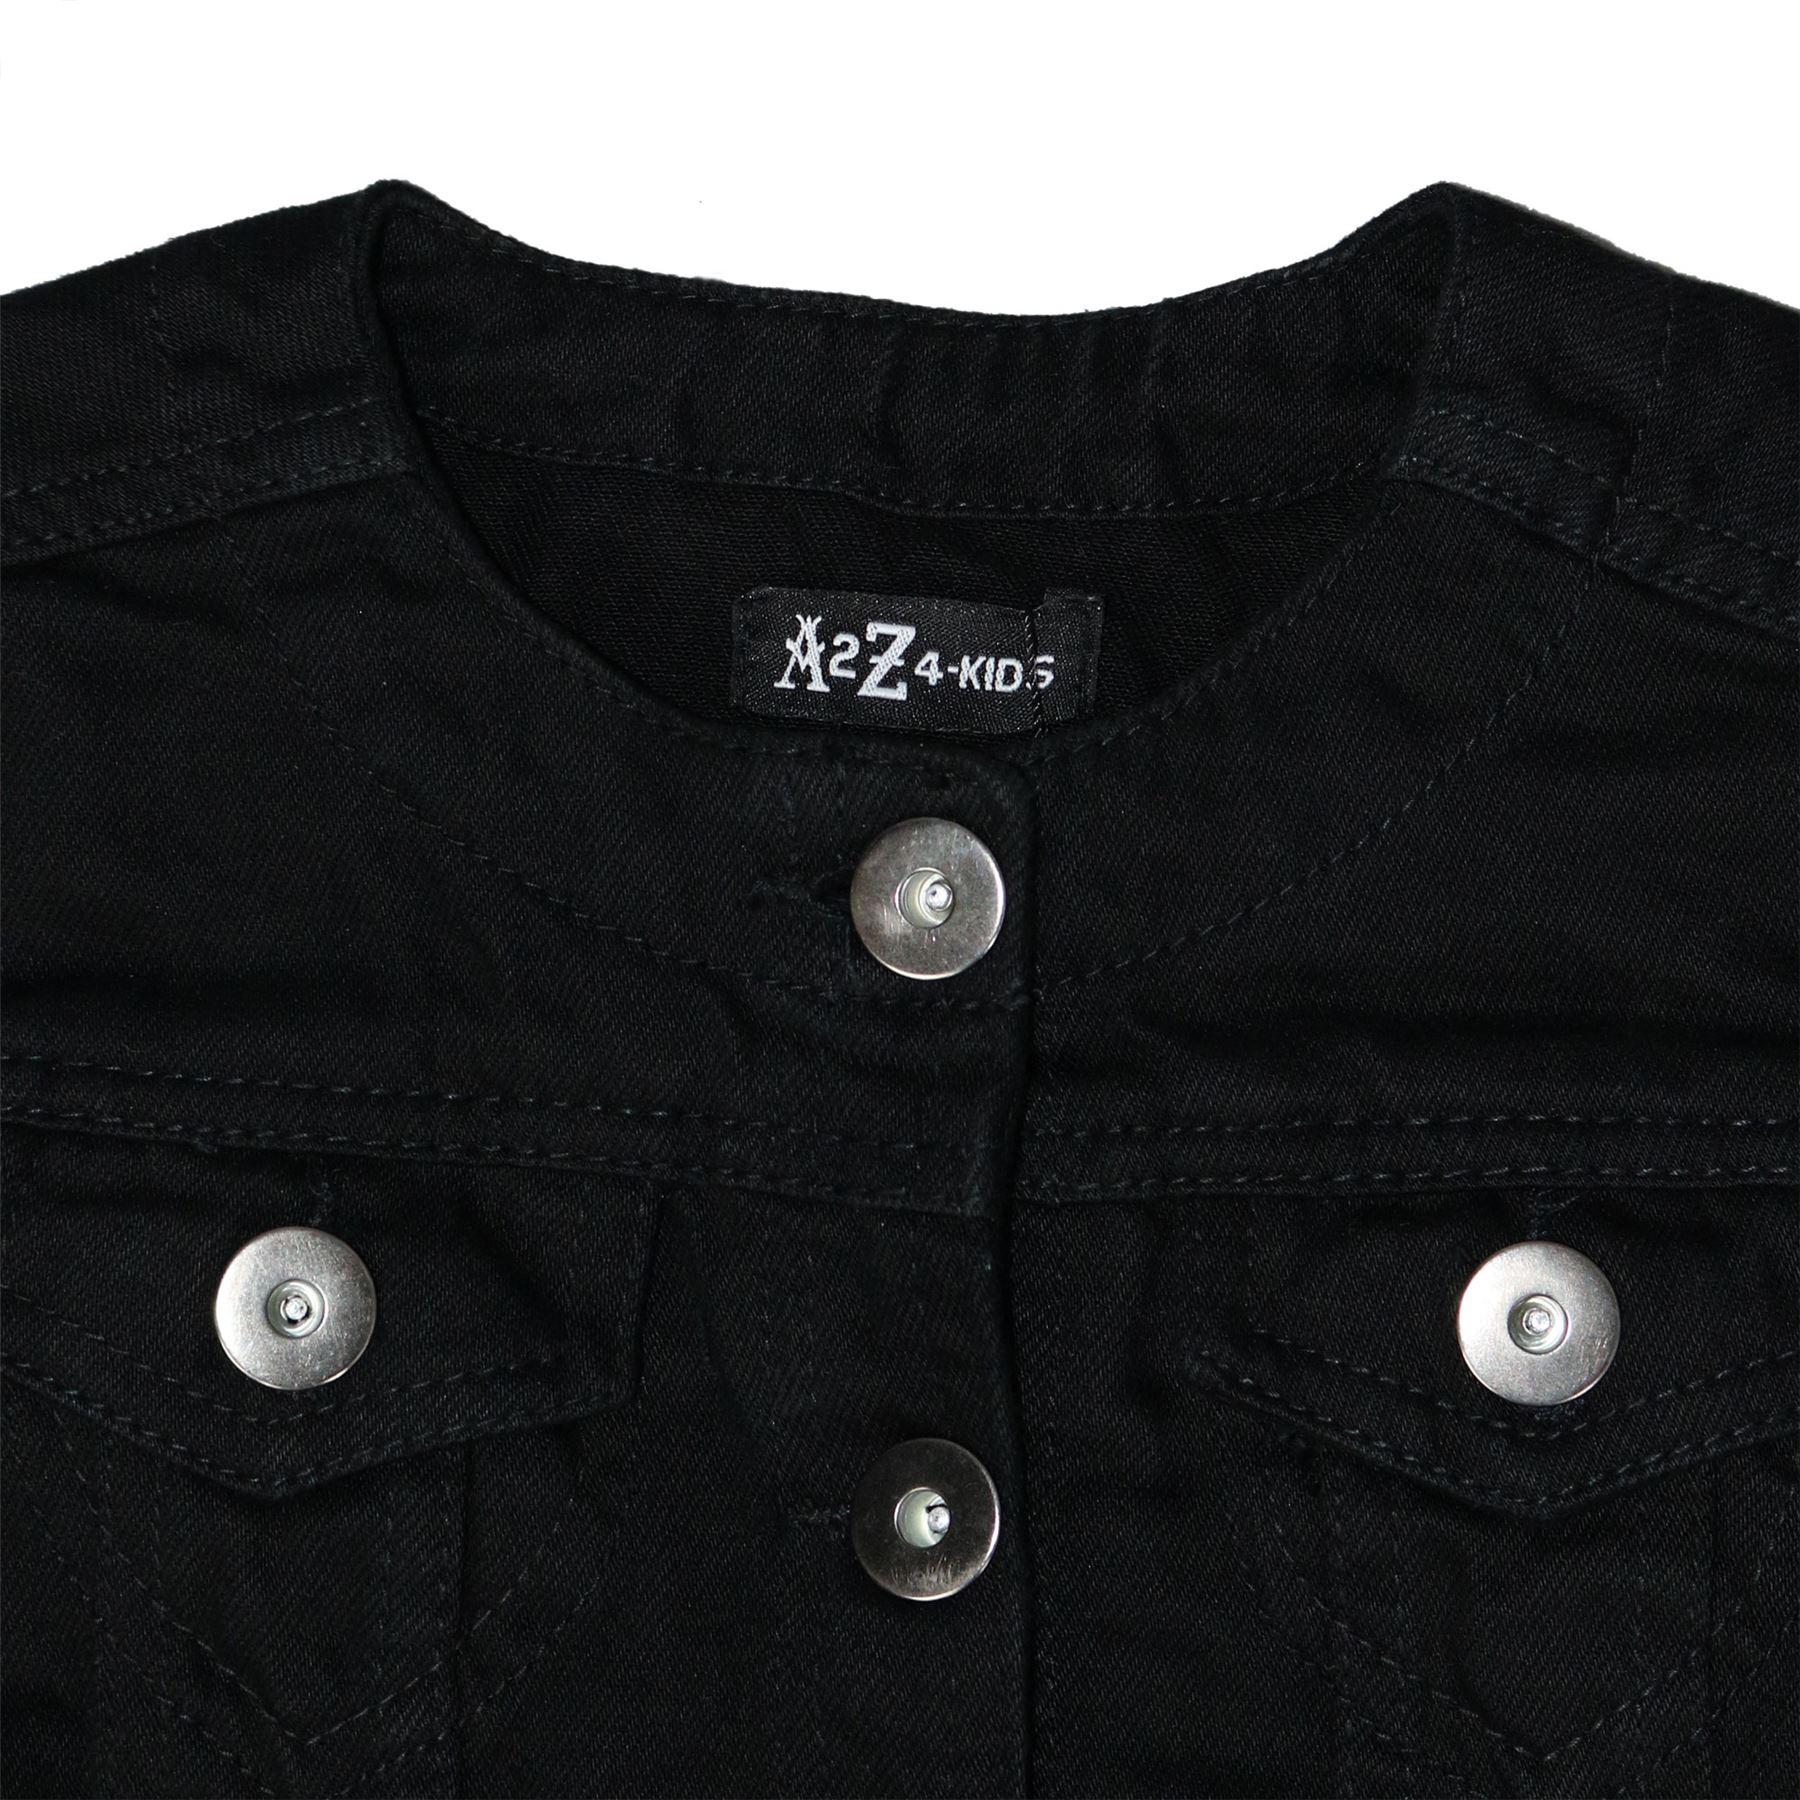 e4b3150ec211 Kids Girls Denim Jacket Stylish Fashion Trendy Jeans Jackets Coats ...